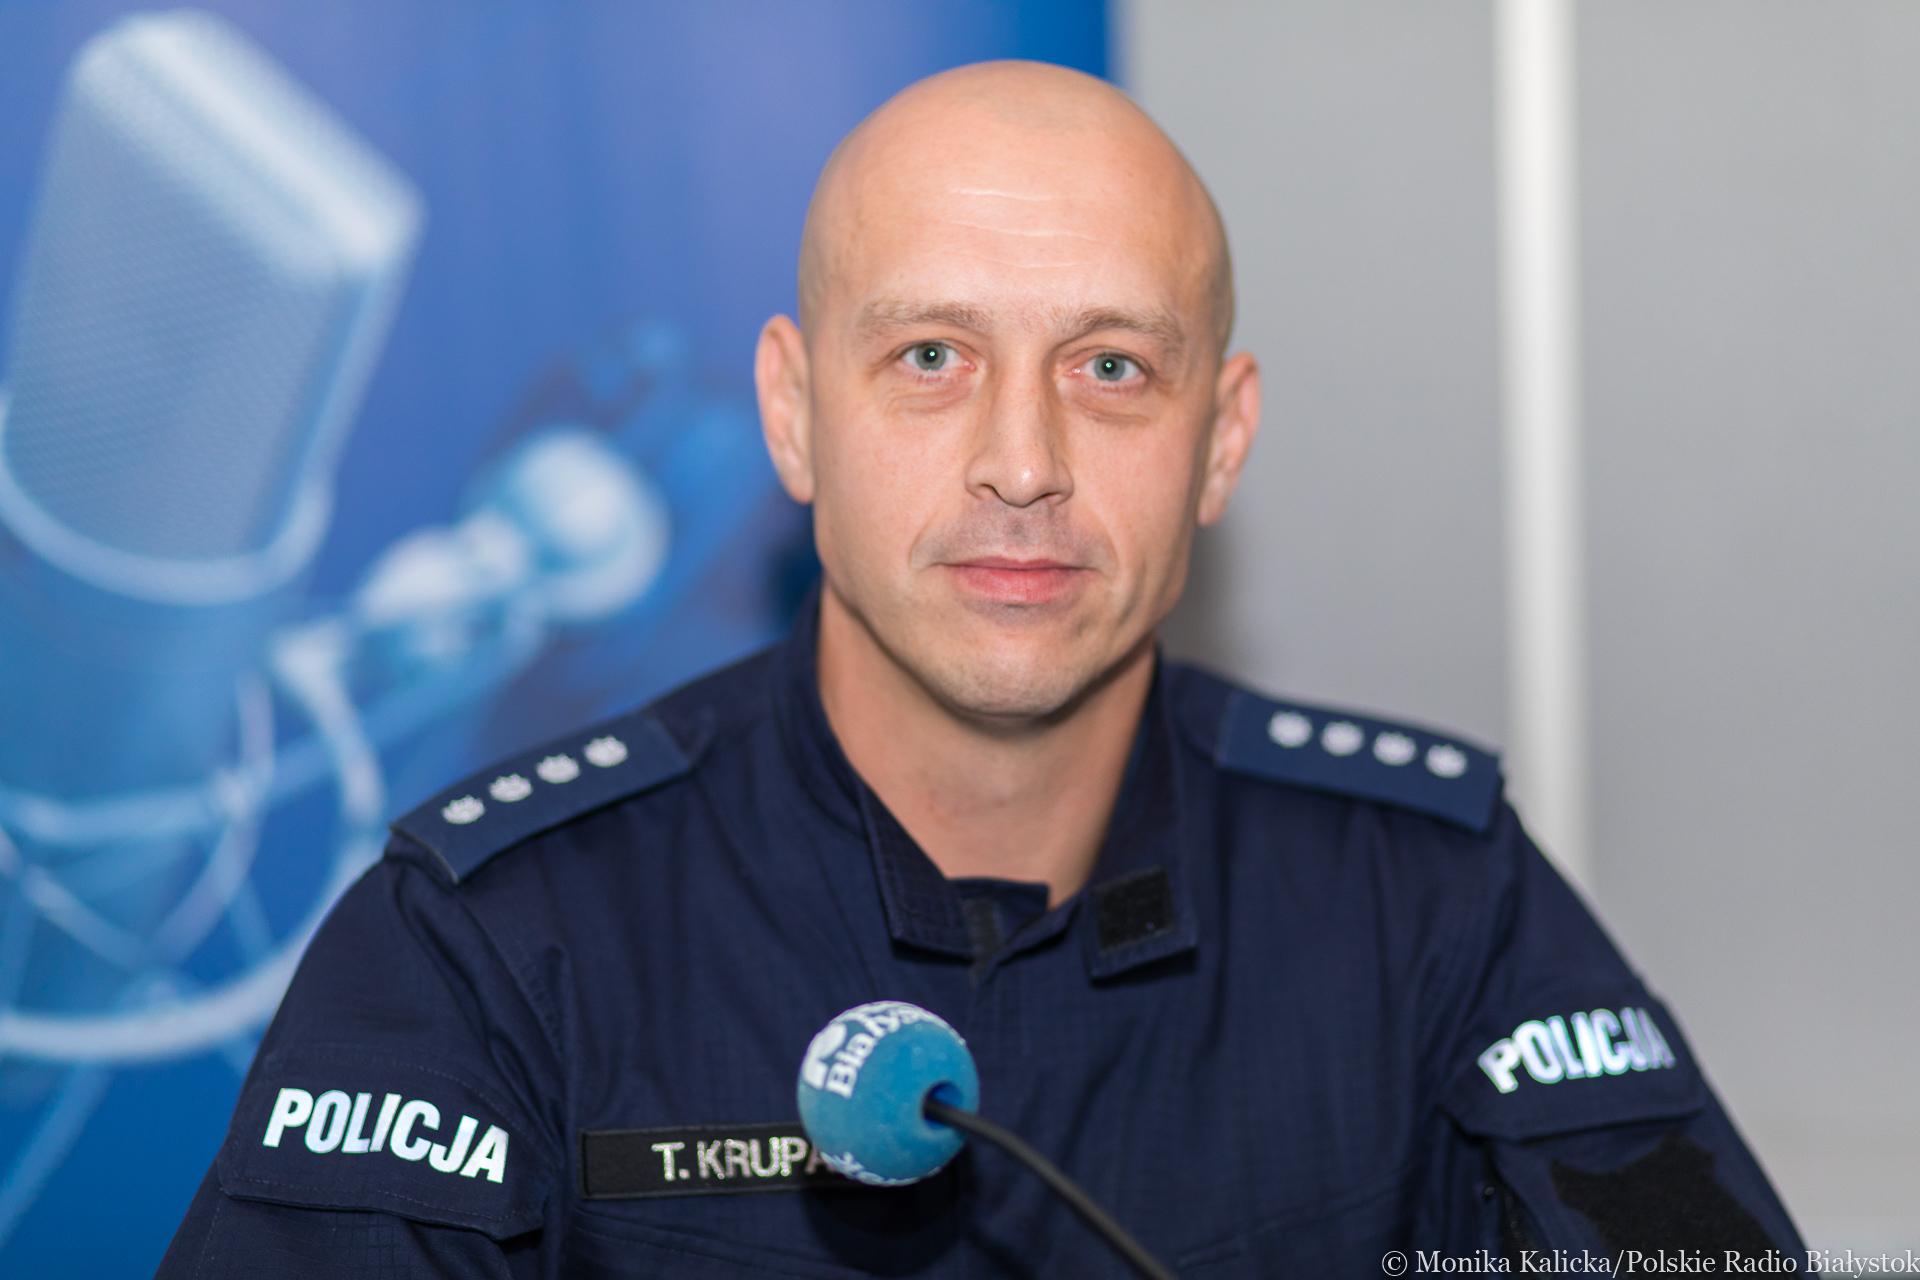 Tomasz Krupa, fot. Monika Kalicka